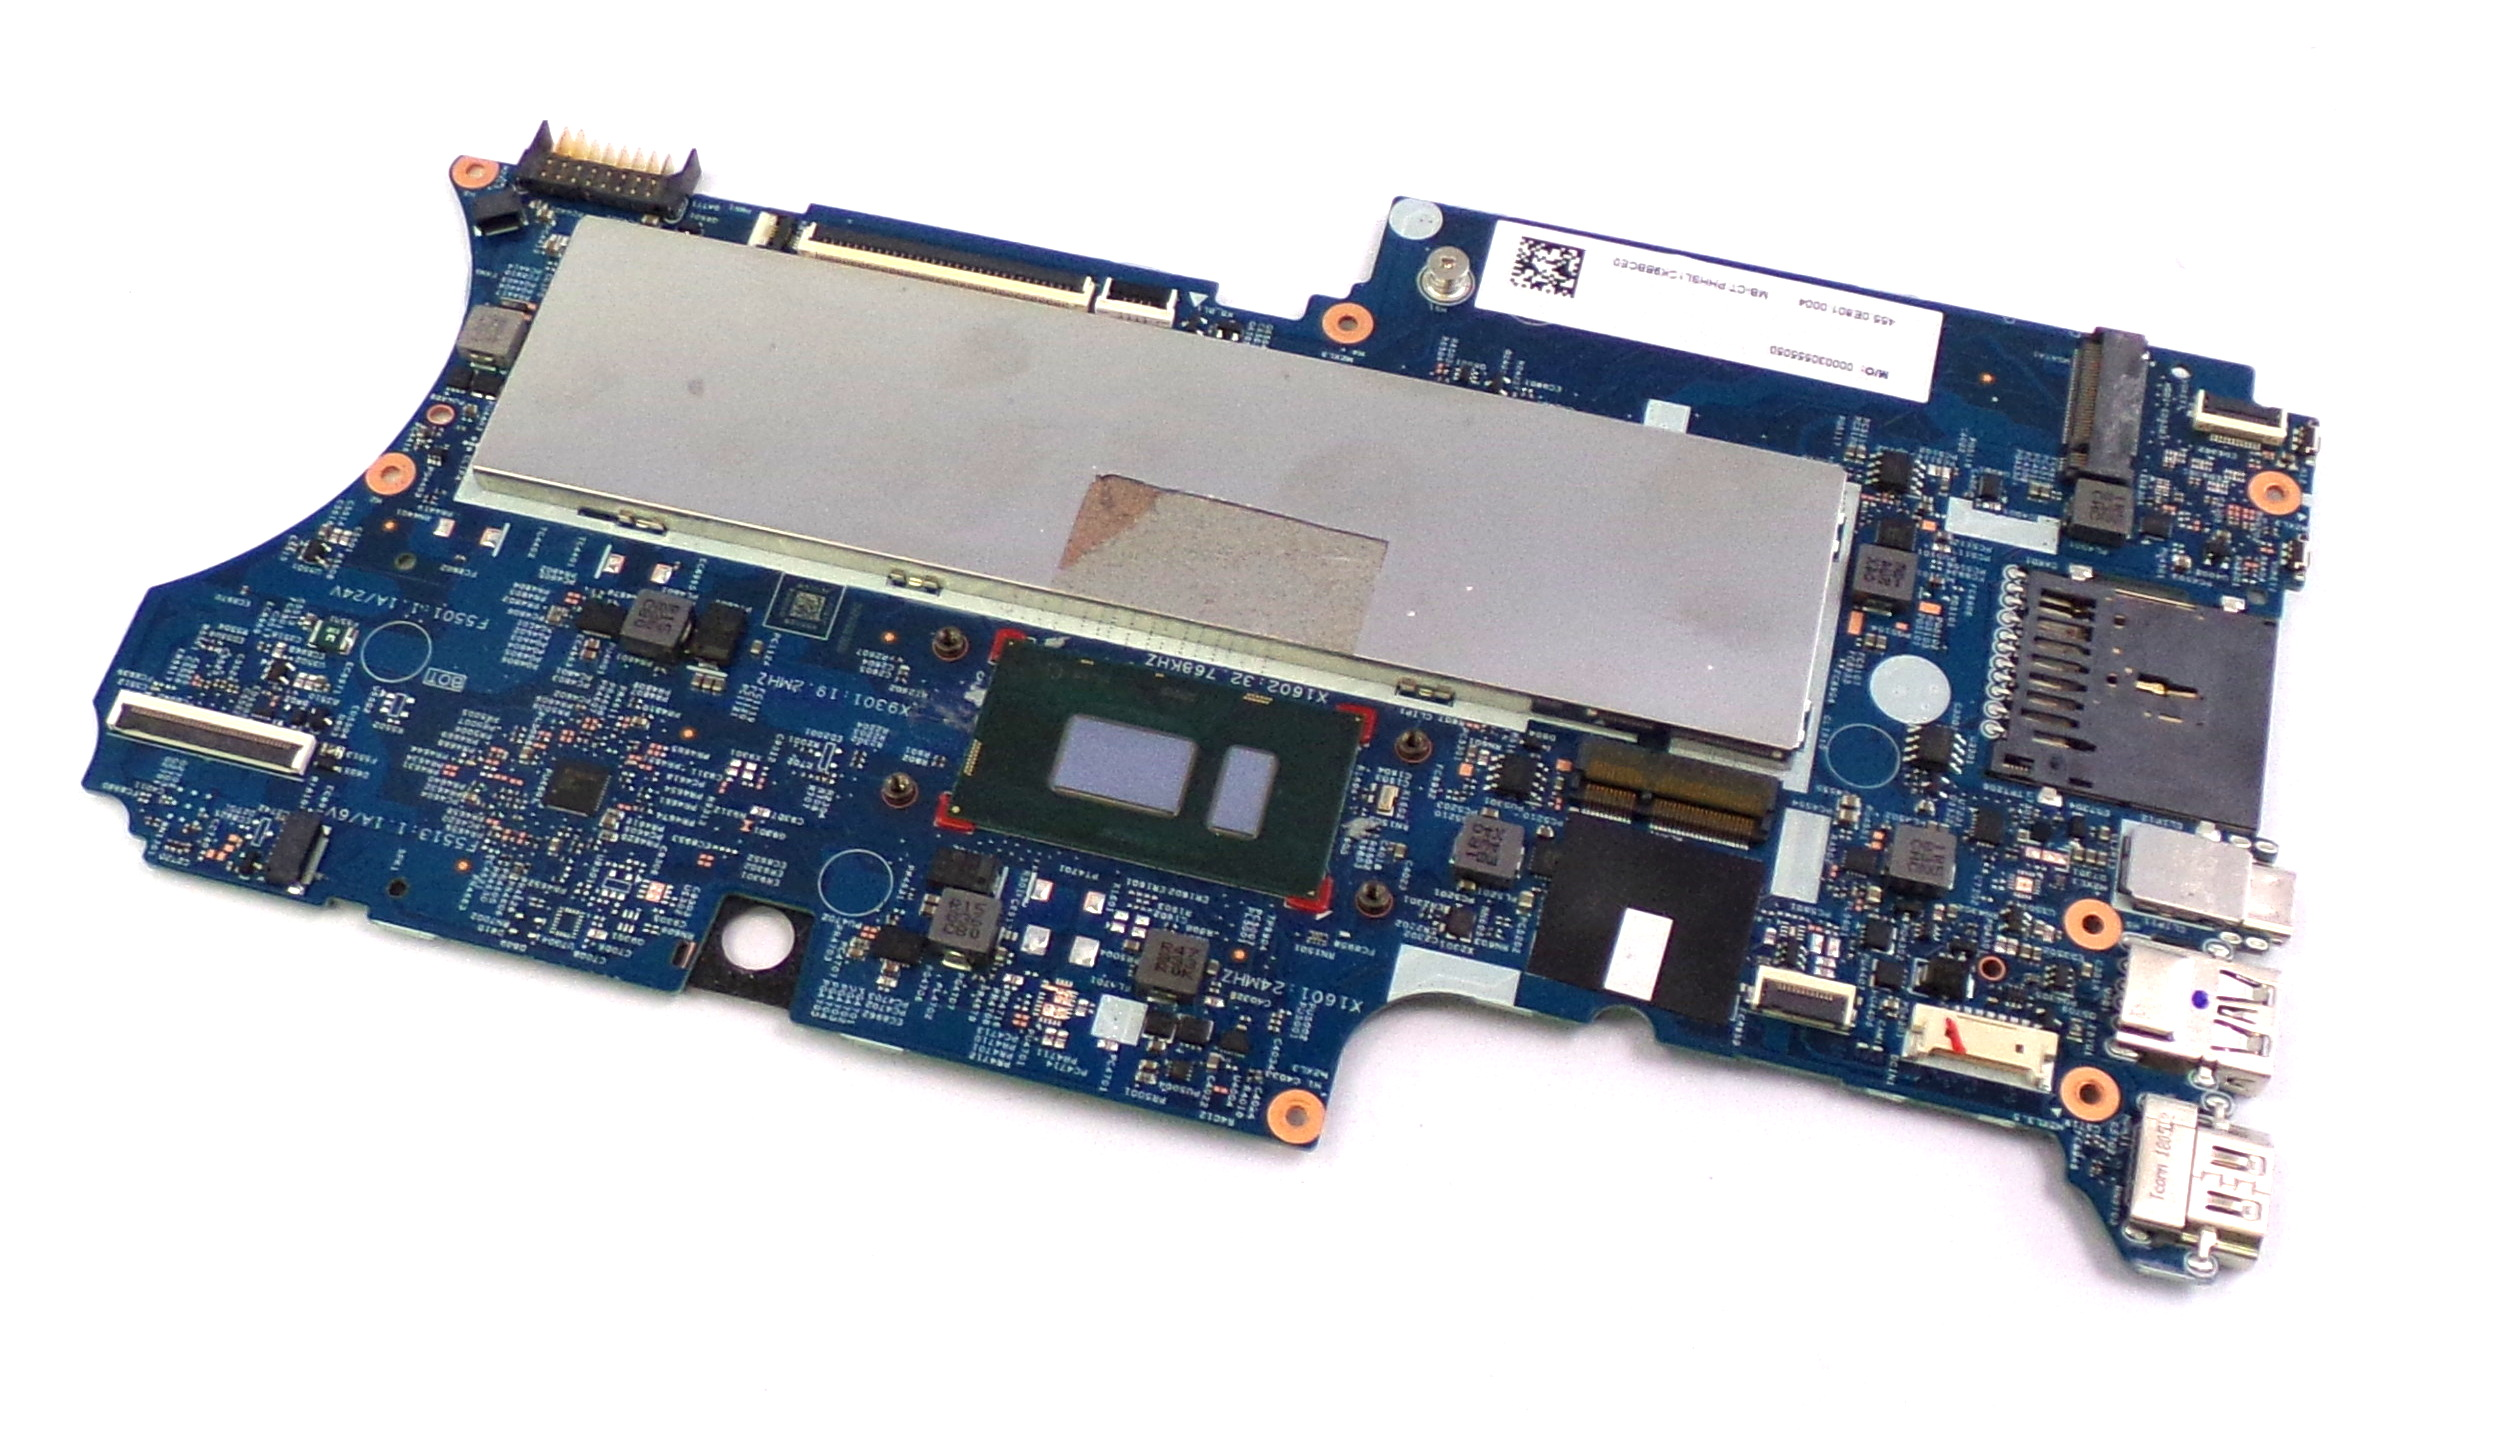 455.0E801.0004 HP Pavilion x360 14-cd0522na with Intel Core i3-8130U Motherboard